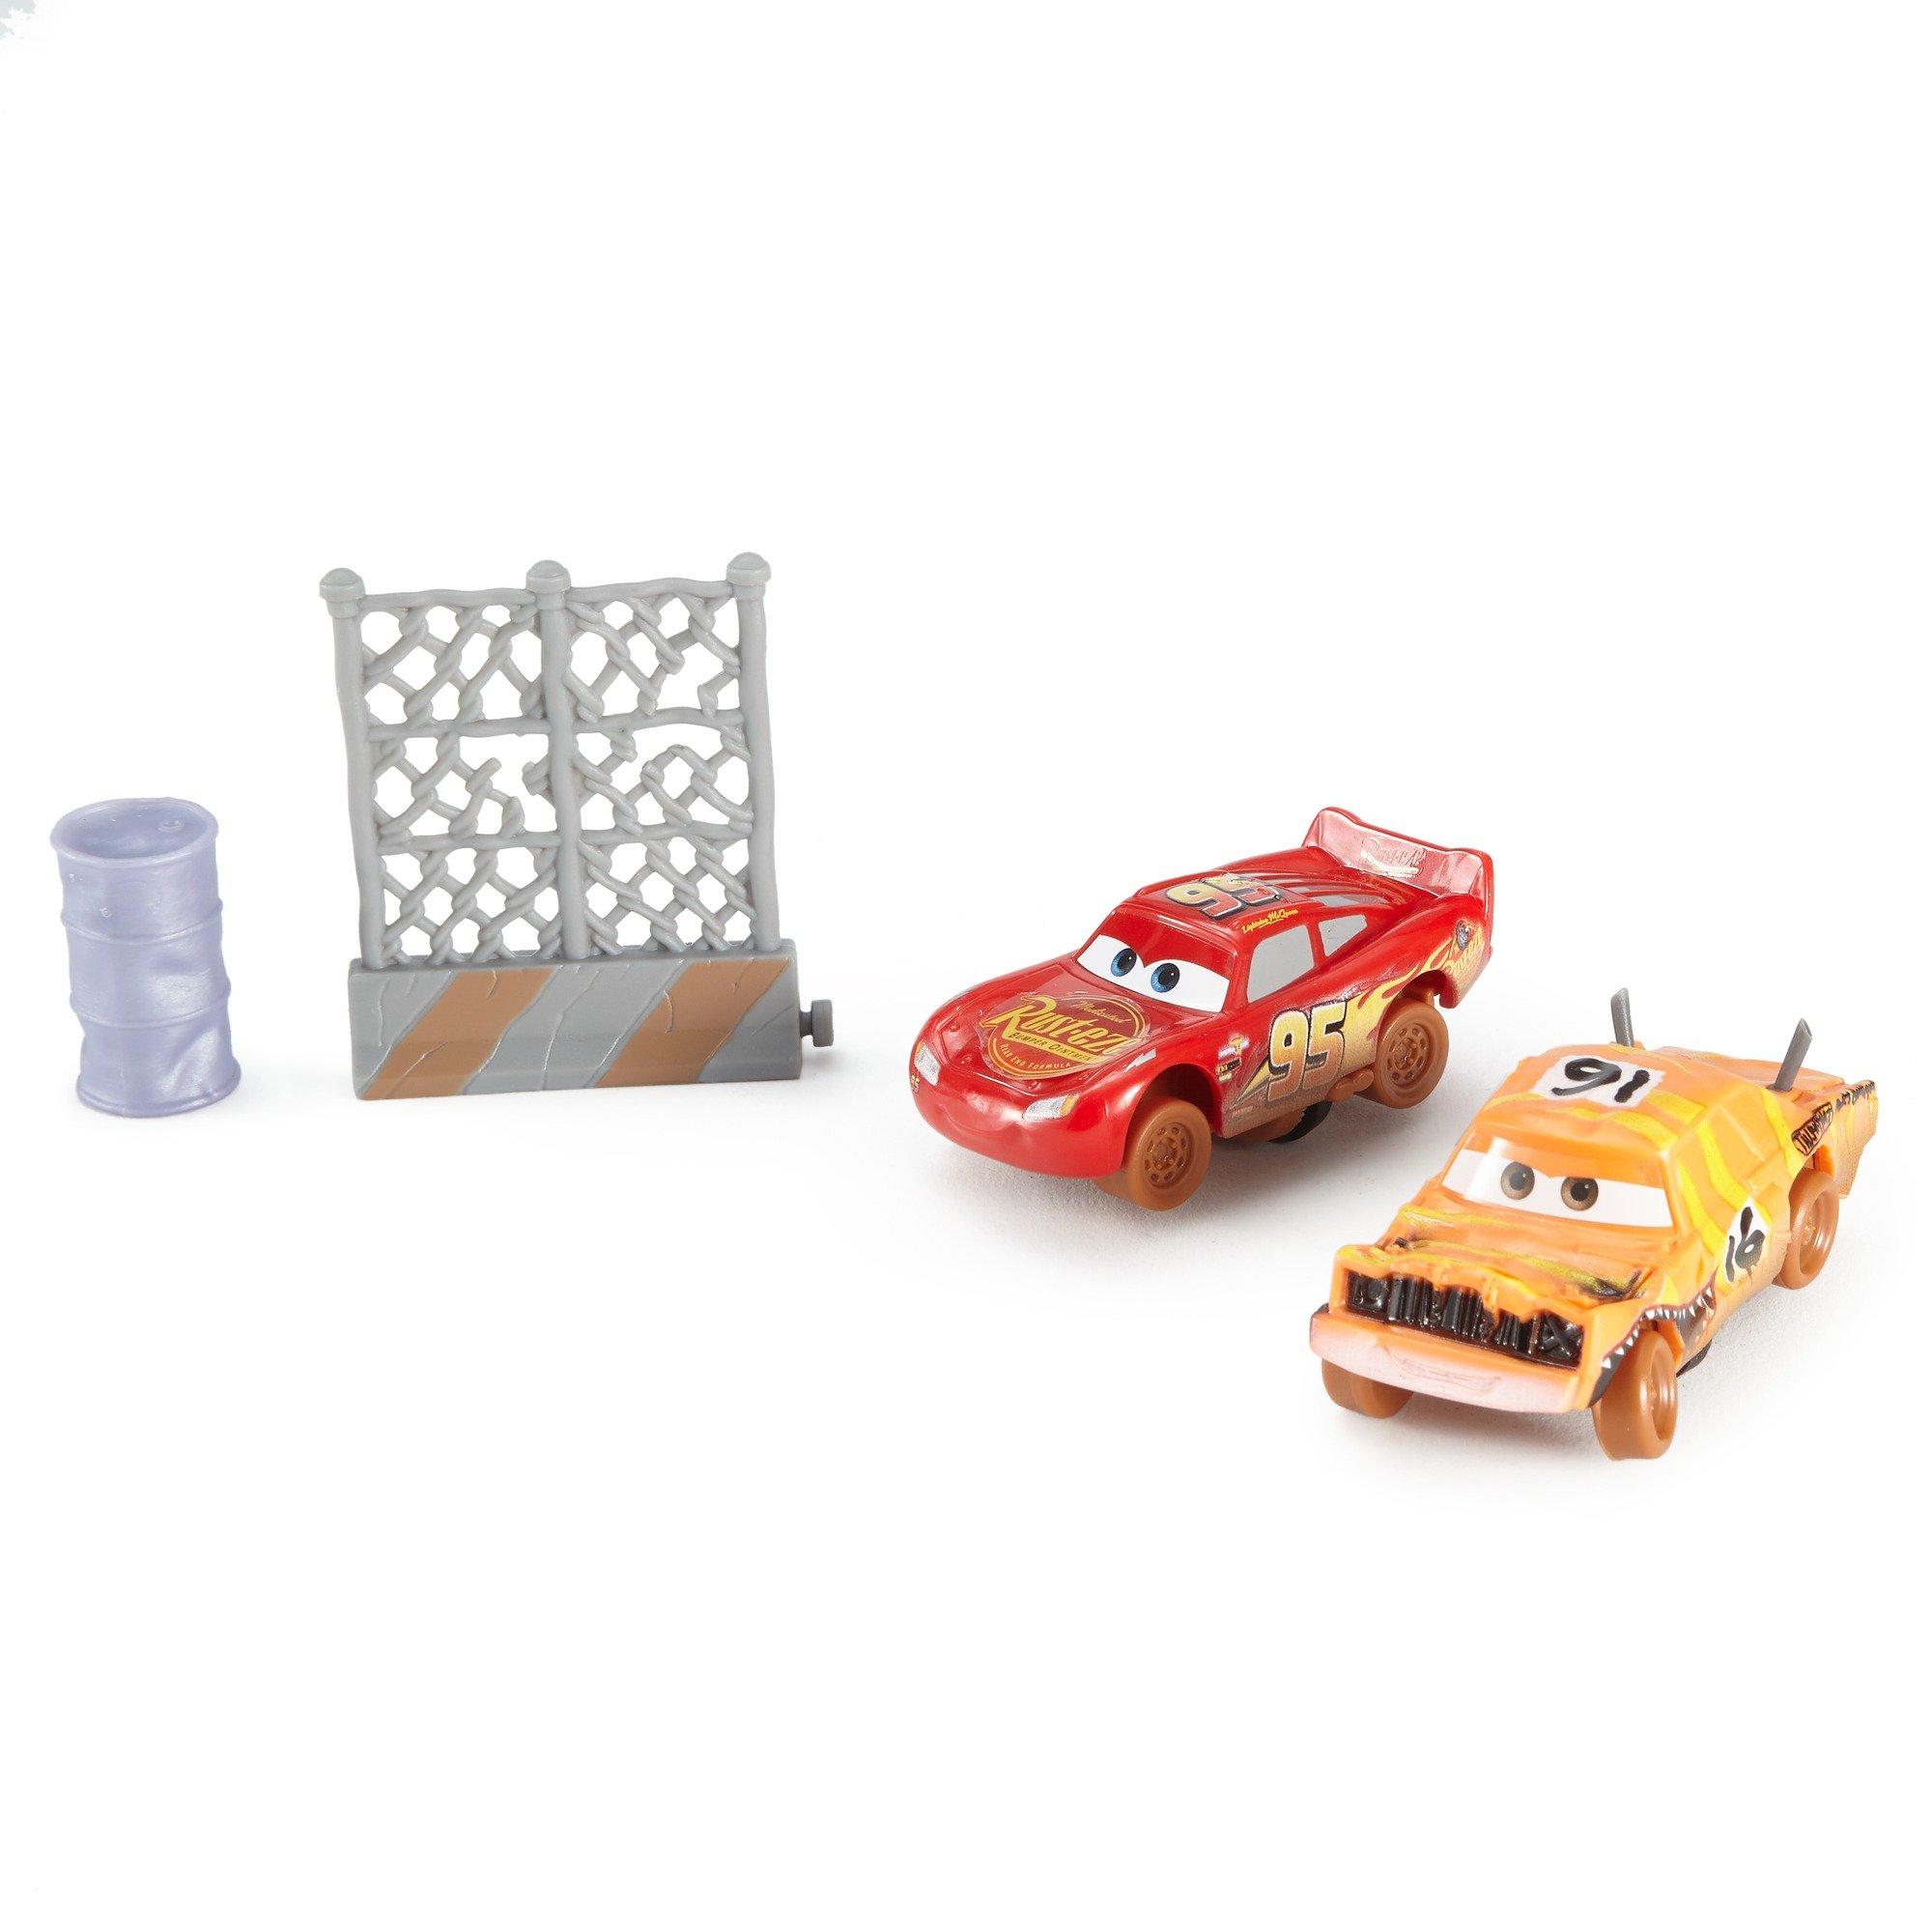 Disney Pixar Cars Cars 3 Crazy 8 Crashers T-Bone /& Jimbo Vehicle 2-Pack